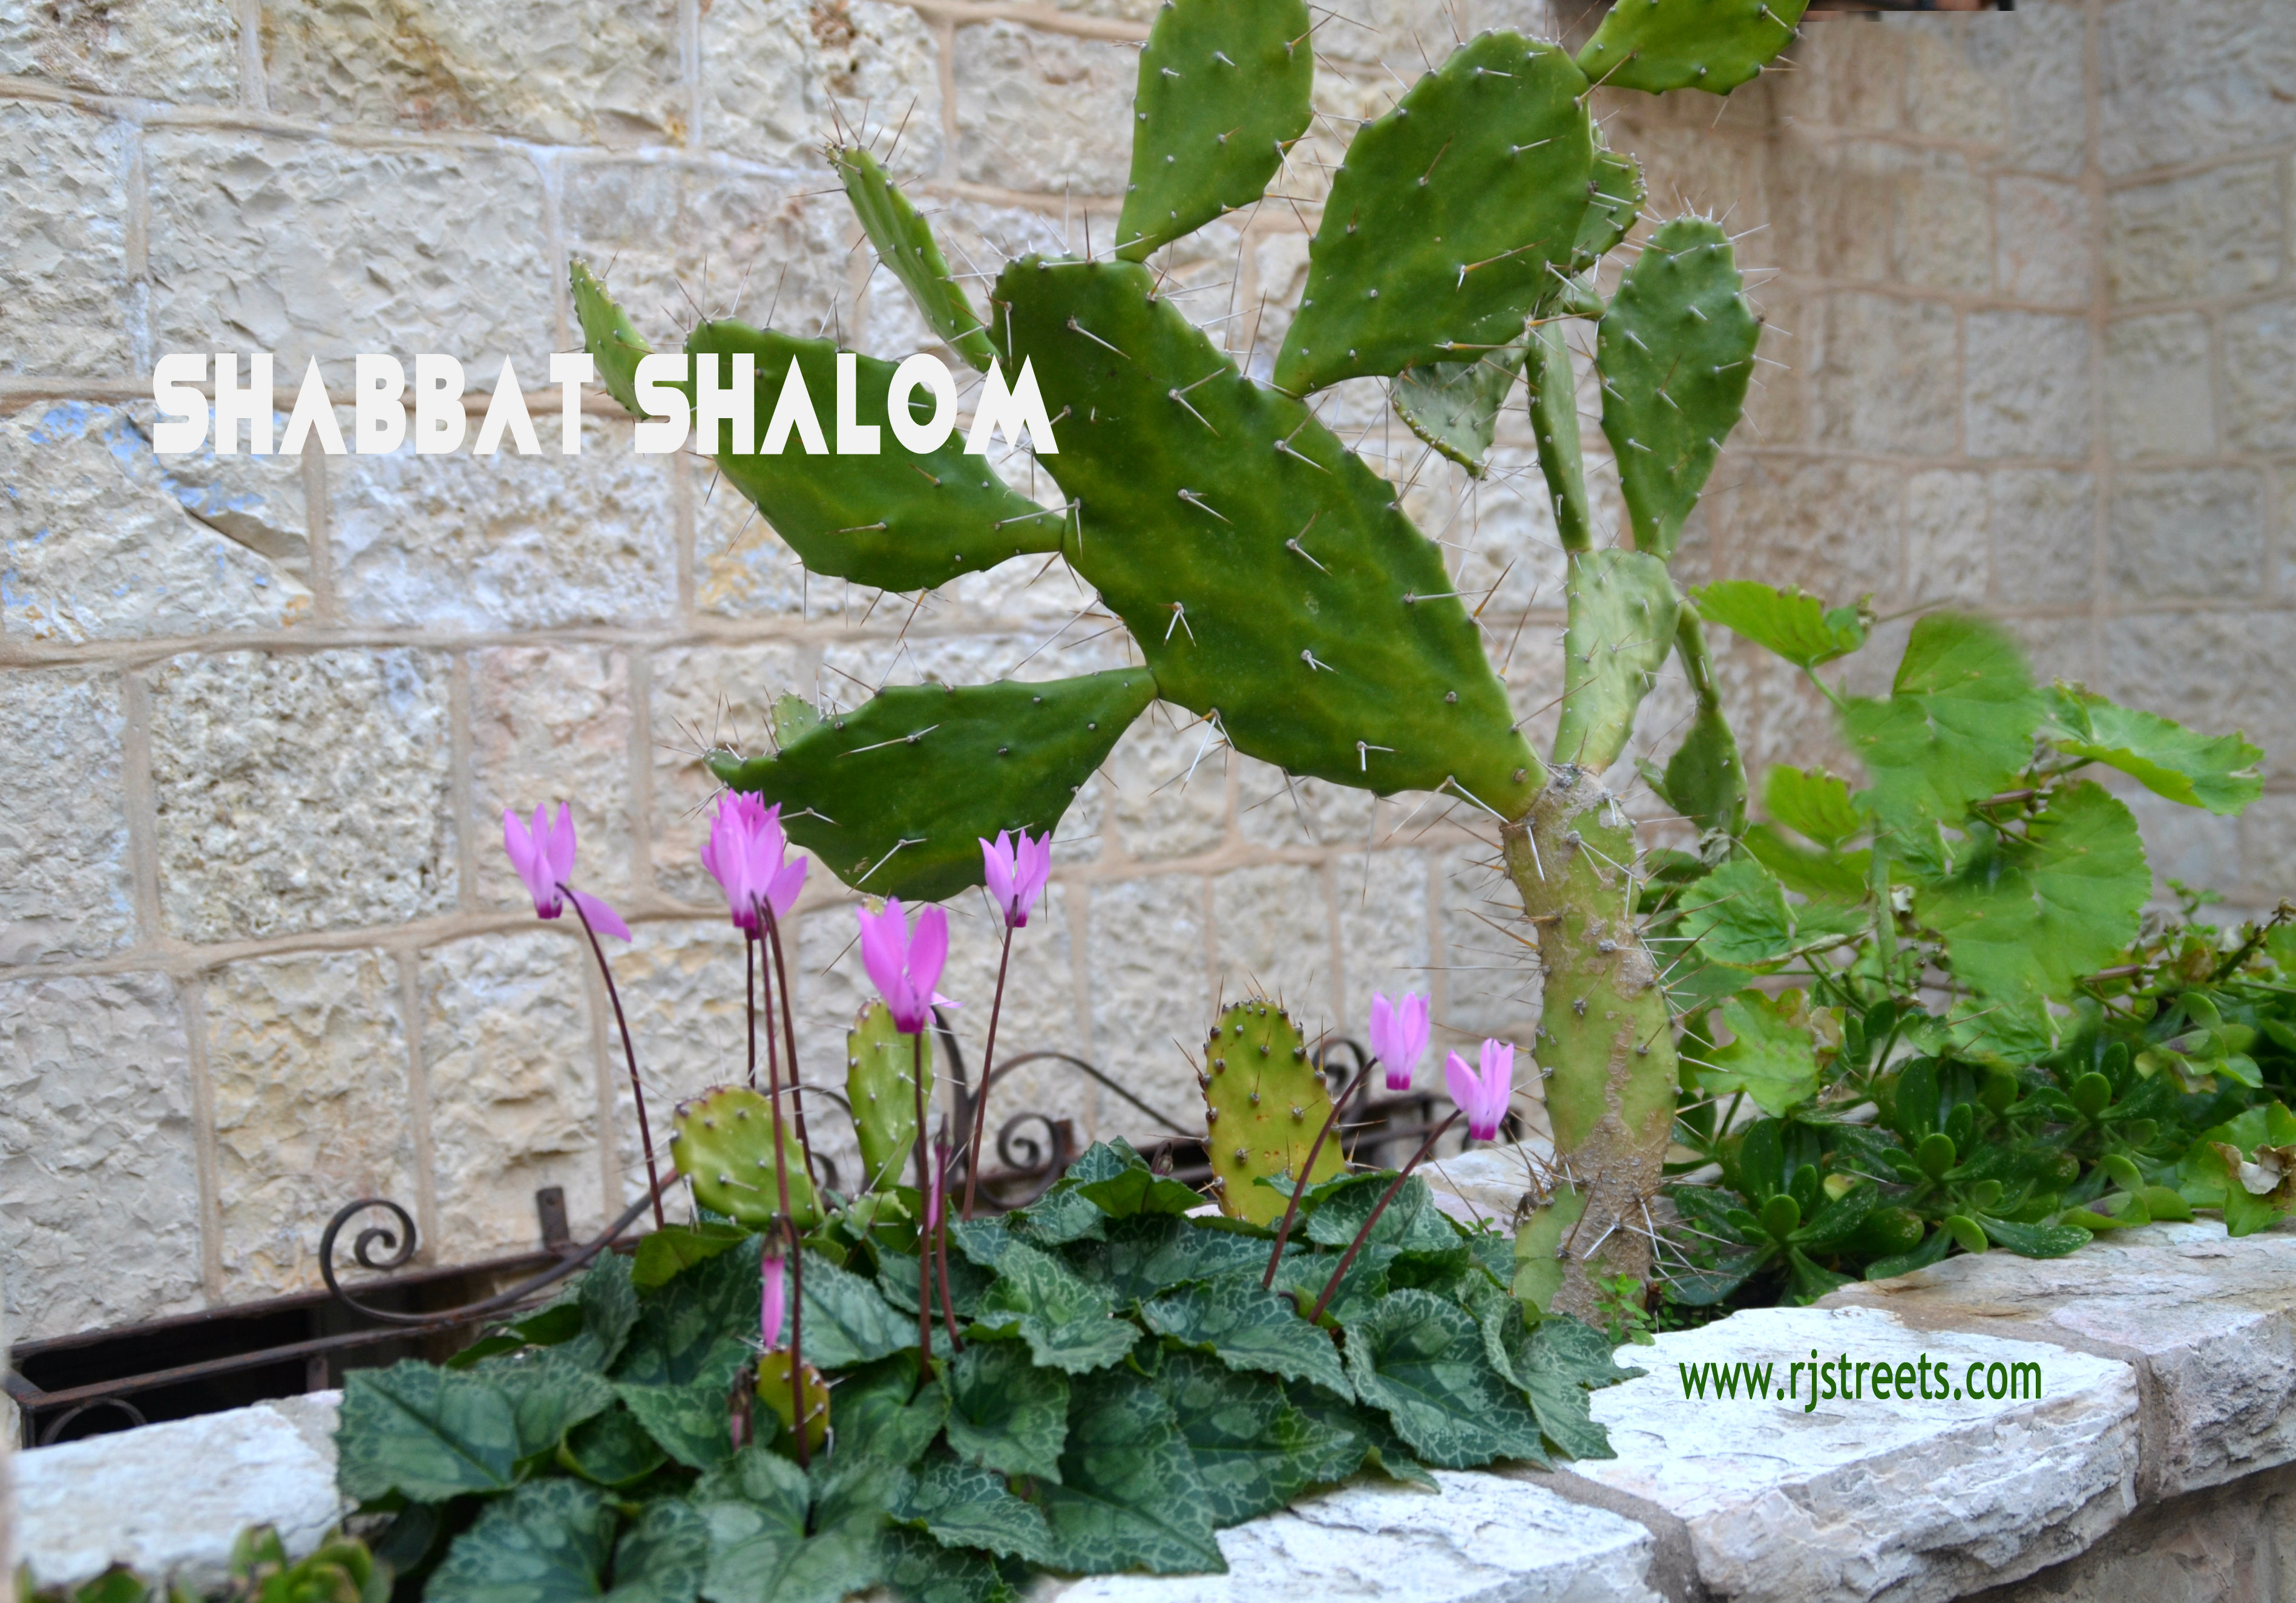 poster Shabbat Shalom